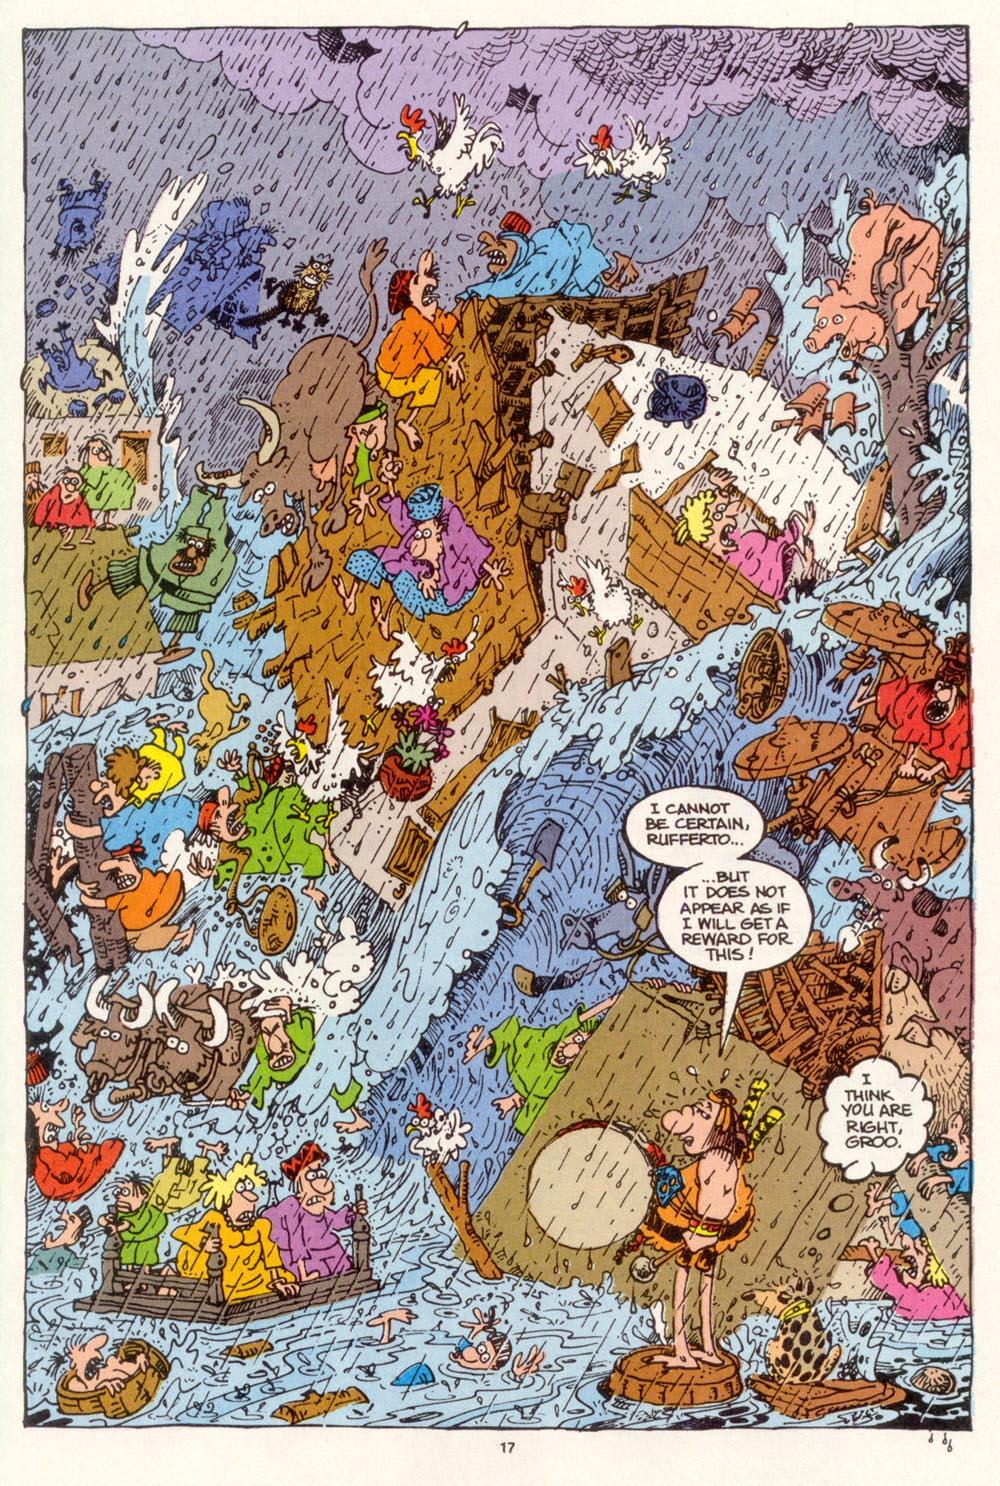 Read online Sergio Aragonés Groo the Wanderer comic -  Issue #113 - 19